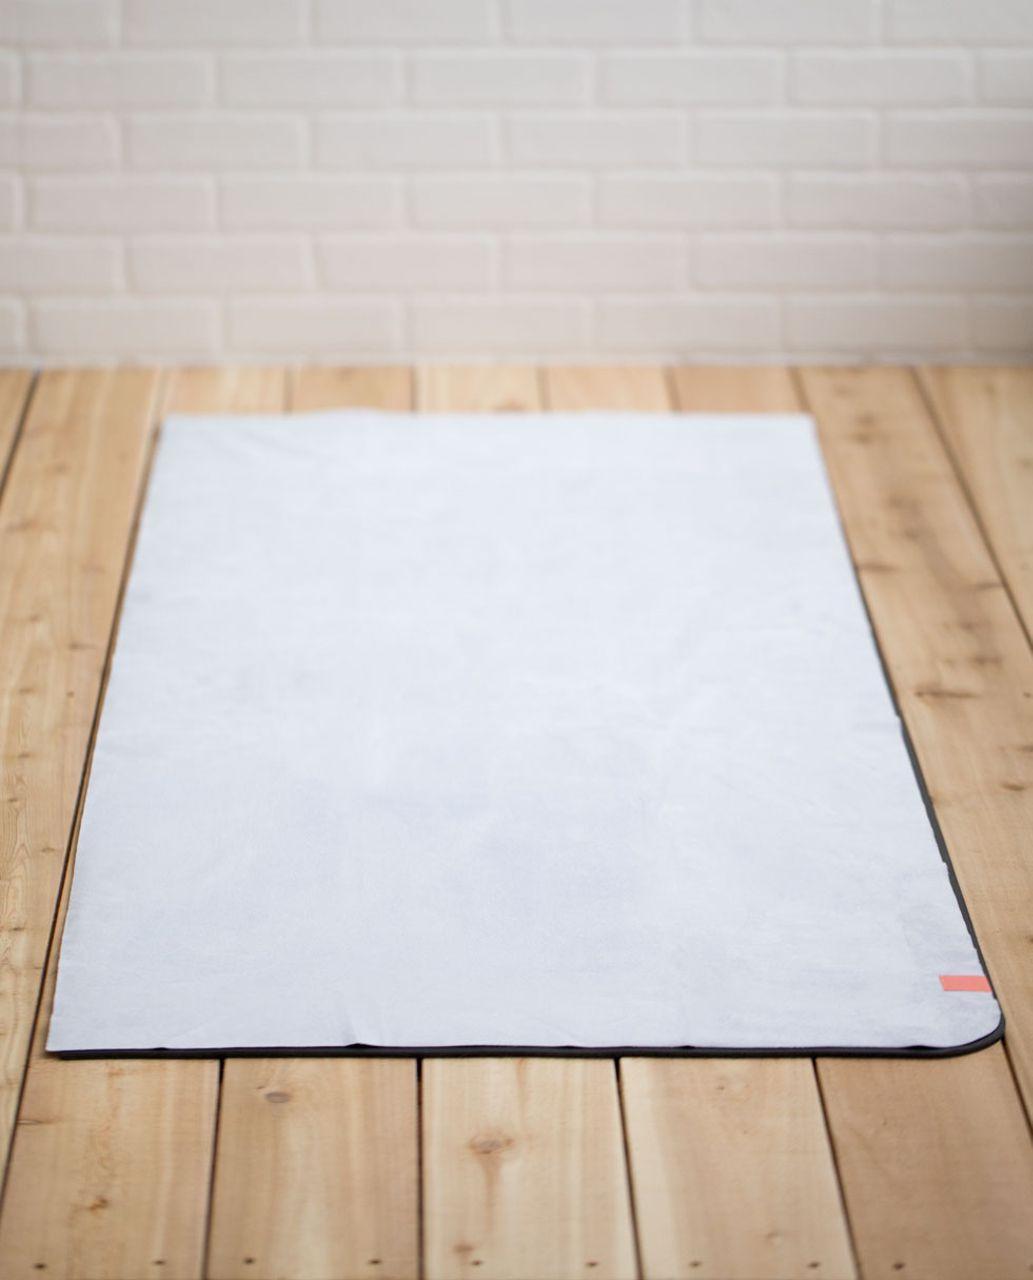 Lululemon The Towel - Early Blue